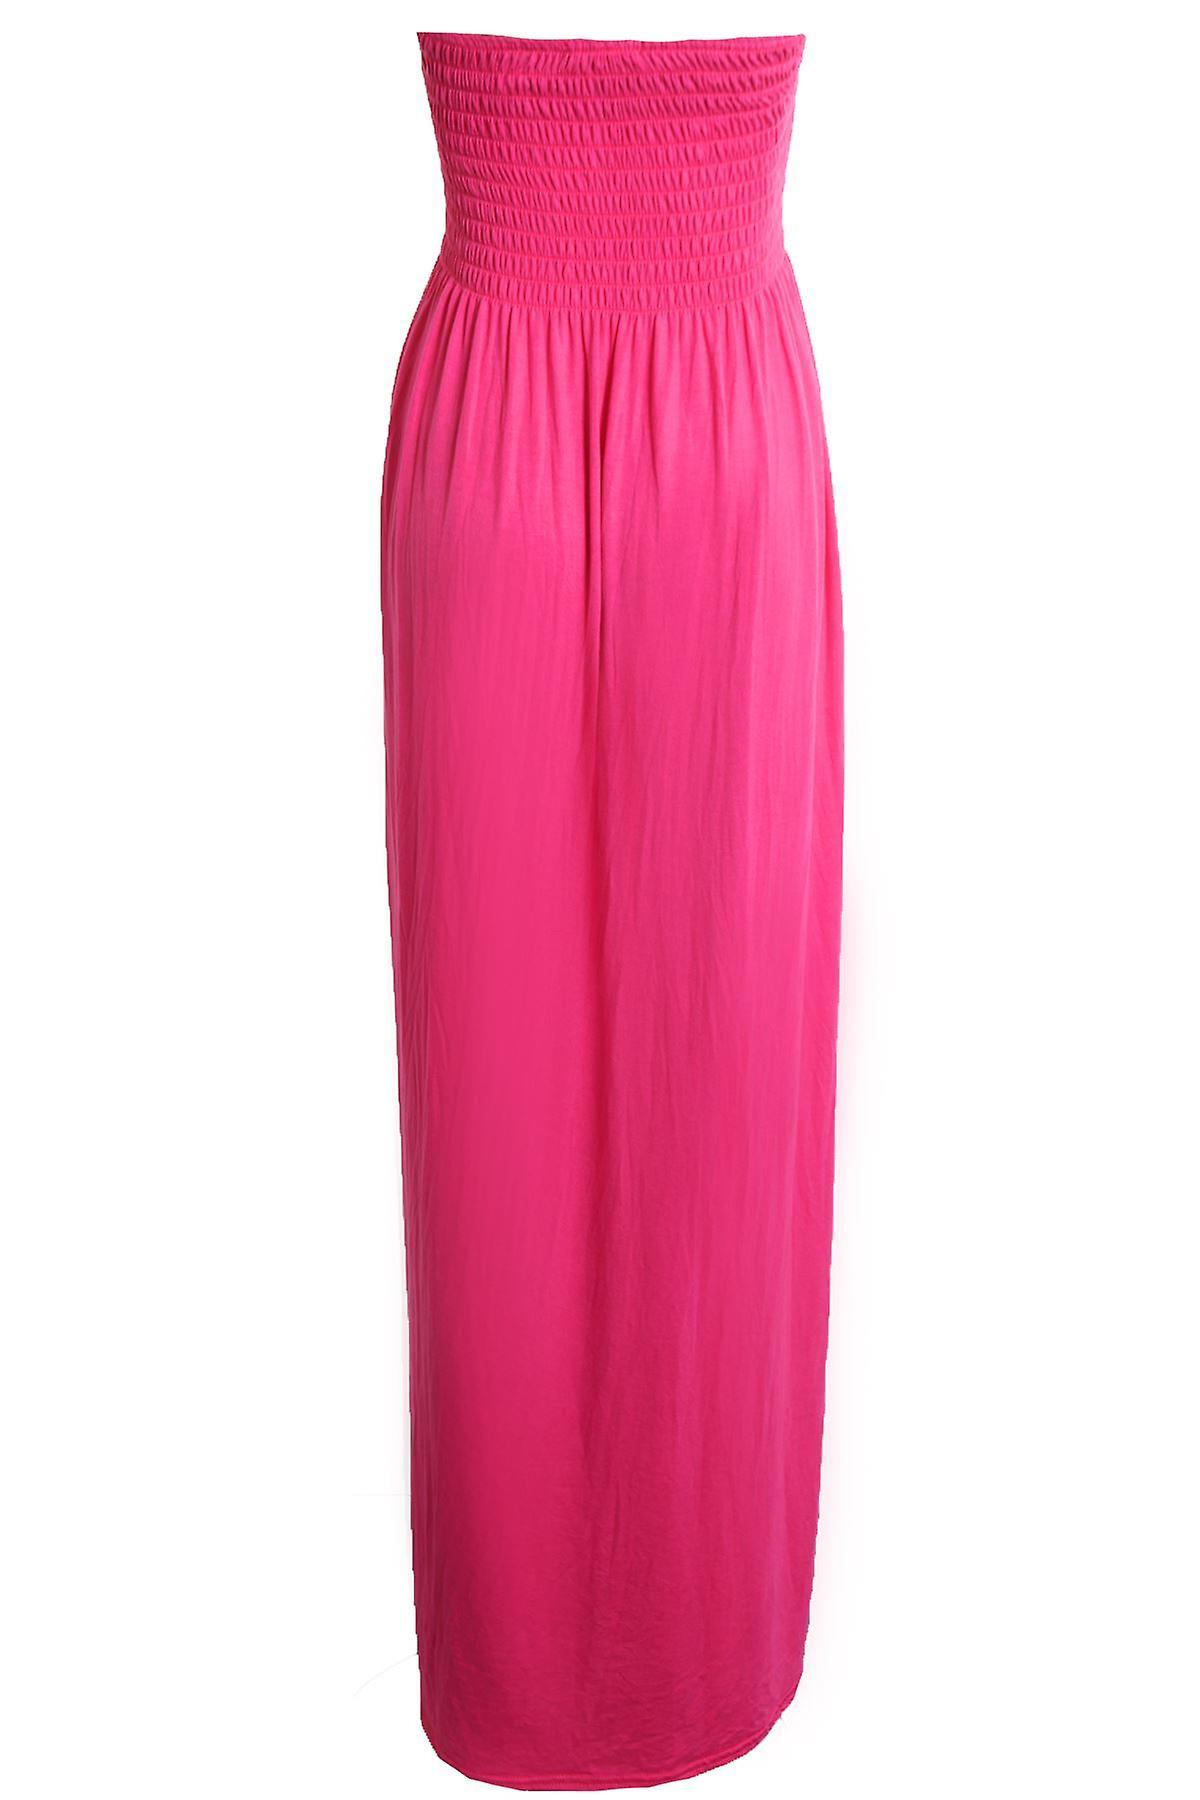 Ladies Summer Sheering Gathered Boobtube Bandea Strapless Long Maxi Women's Dress